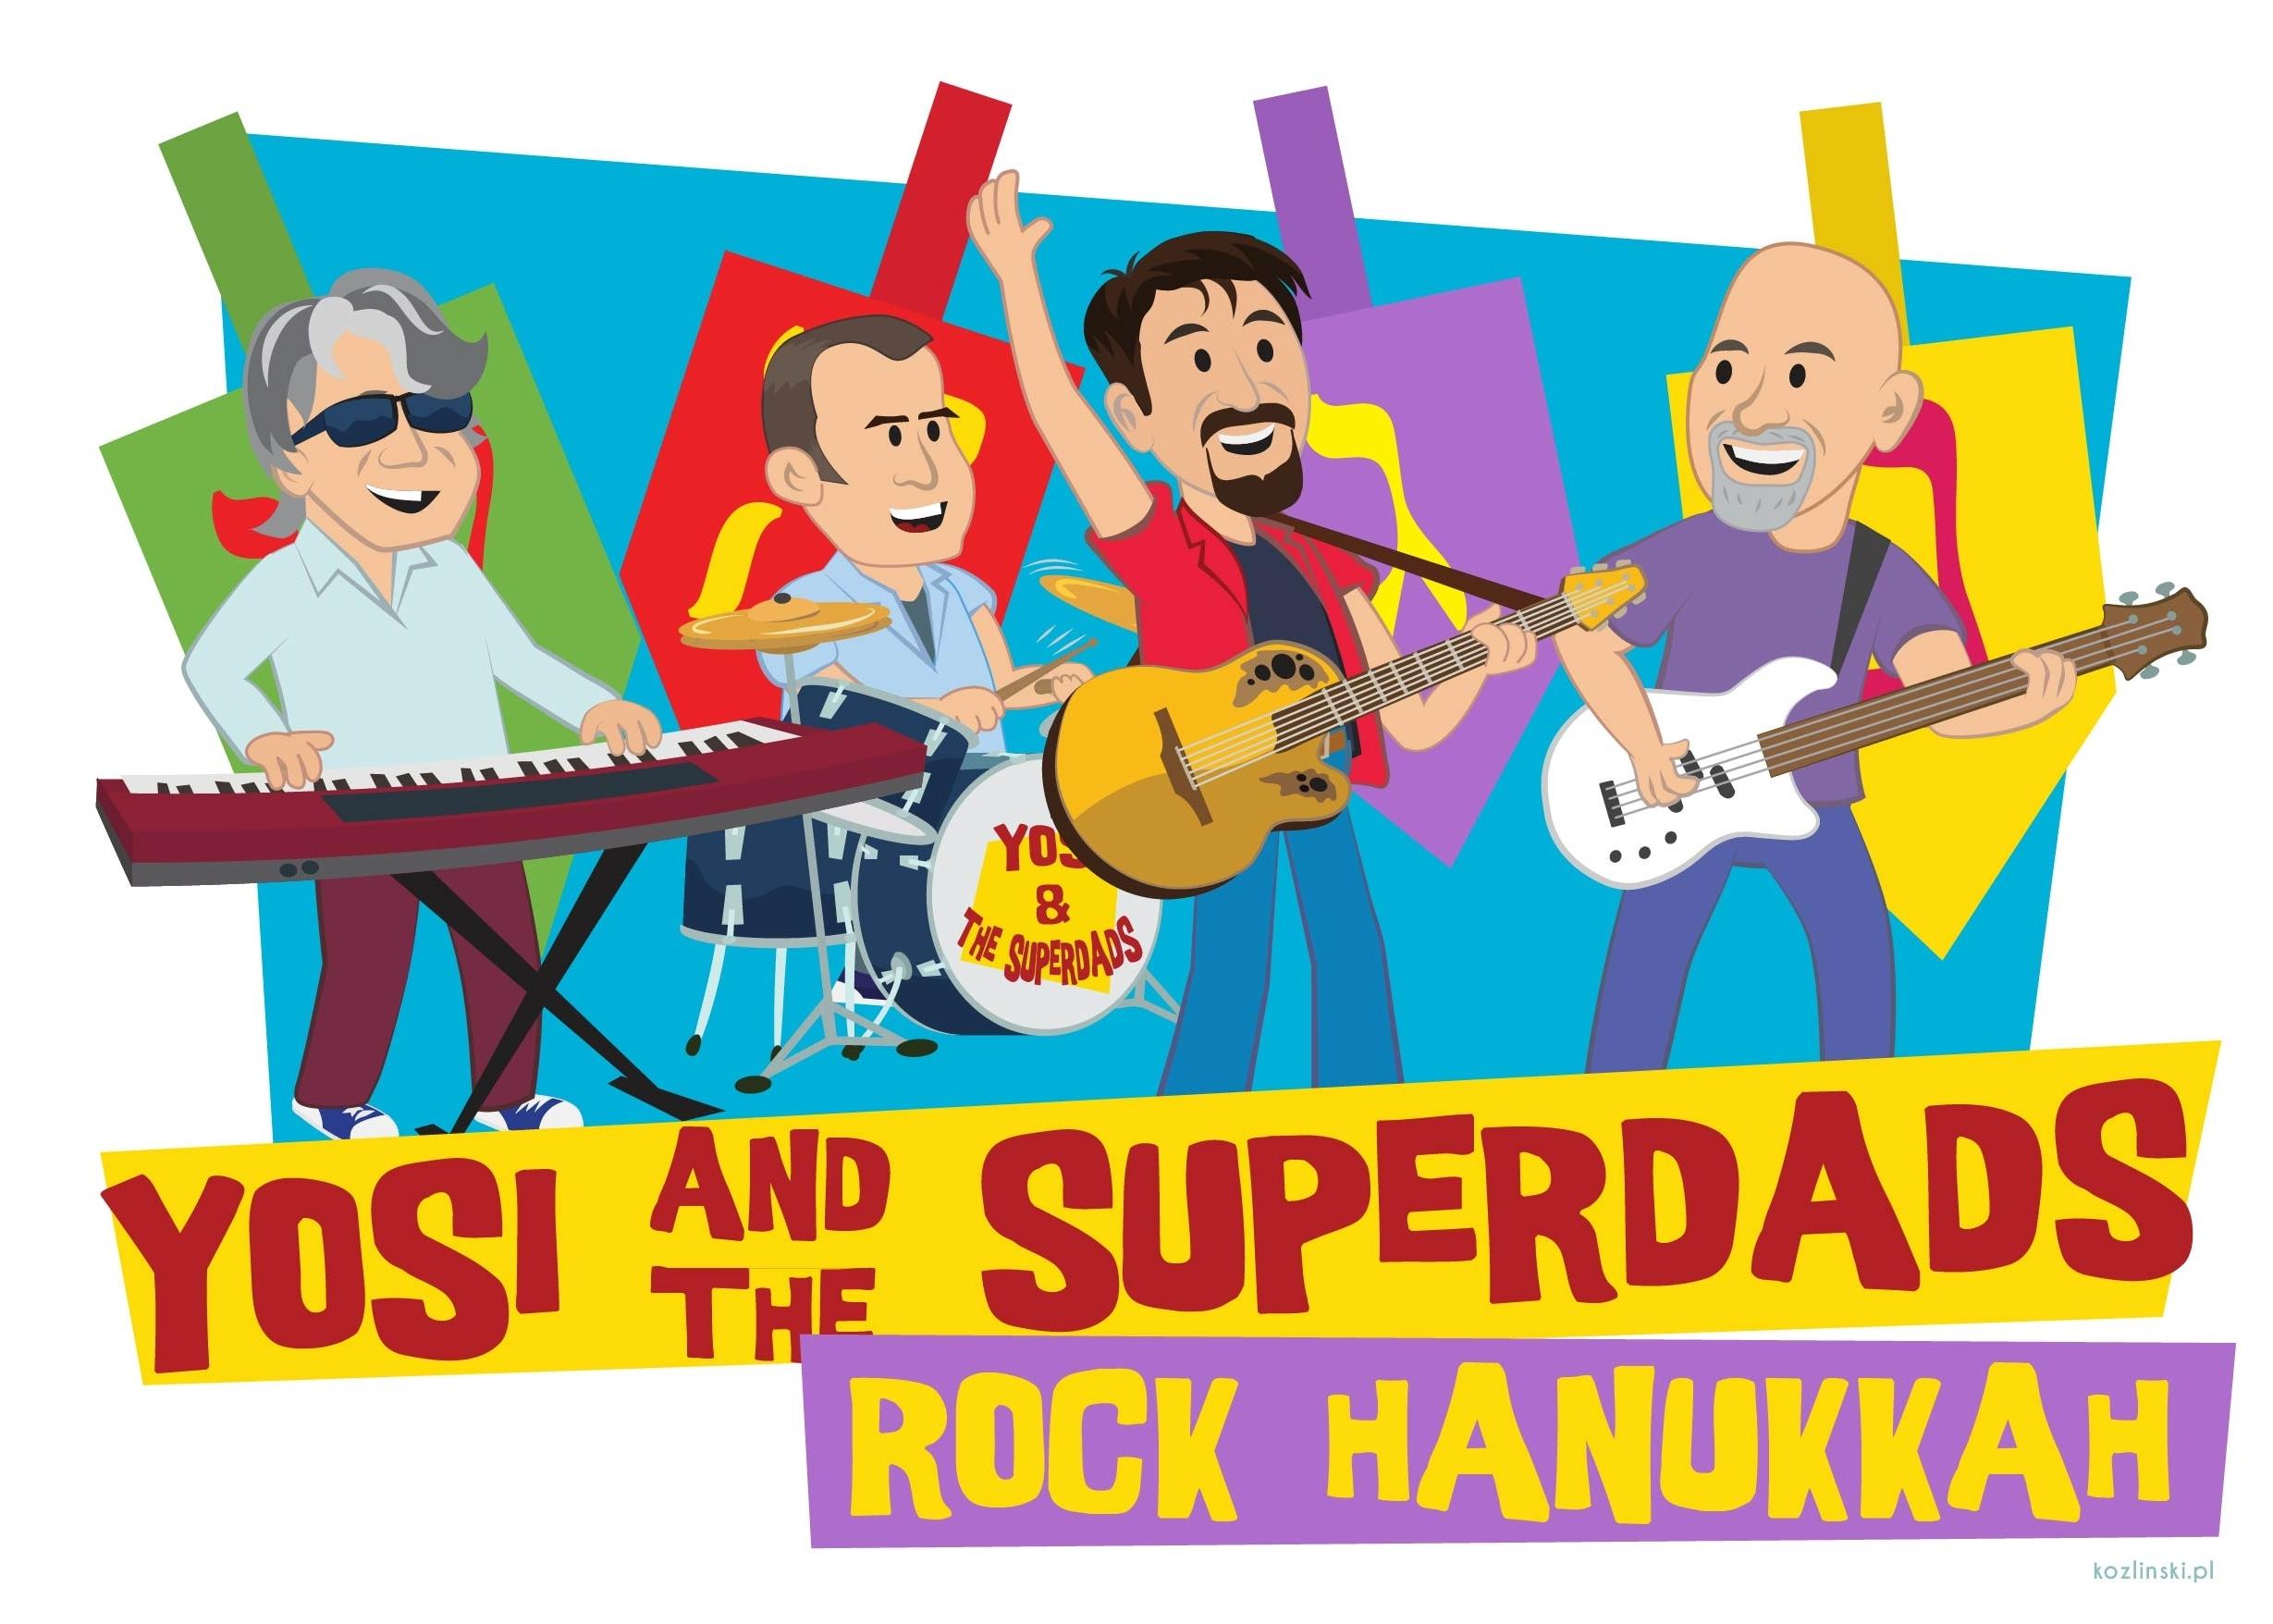 yosi superdads FULL A3 Hanukkah.jpg